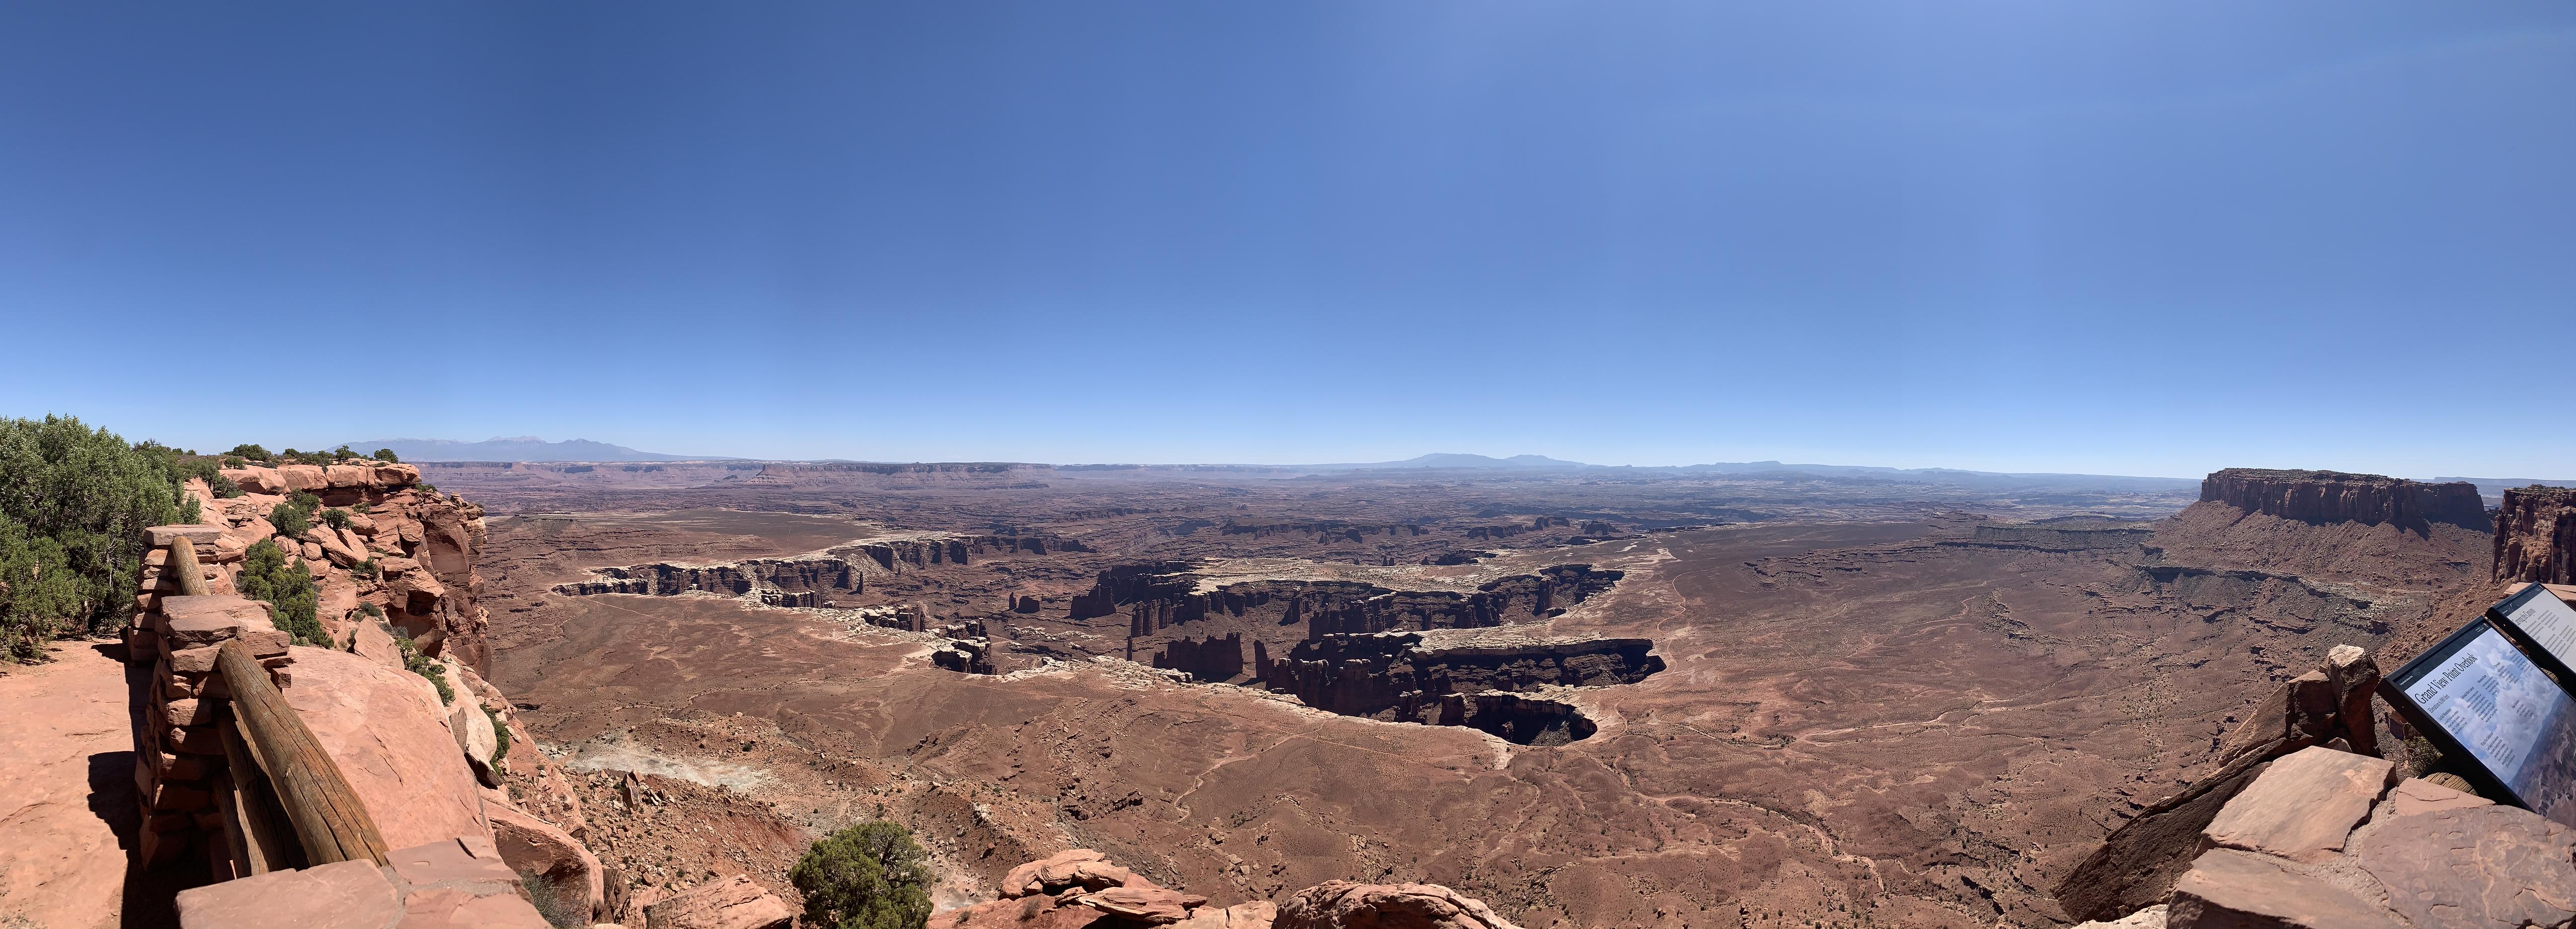 The Best 5-Day Utah Road Trip from Salt Lake City 76